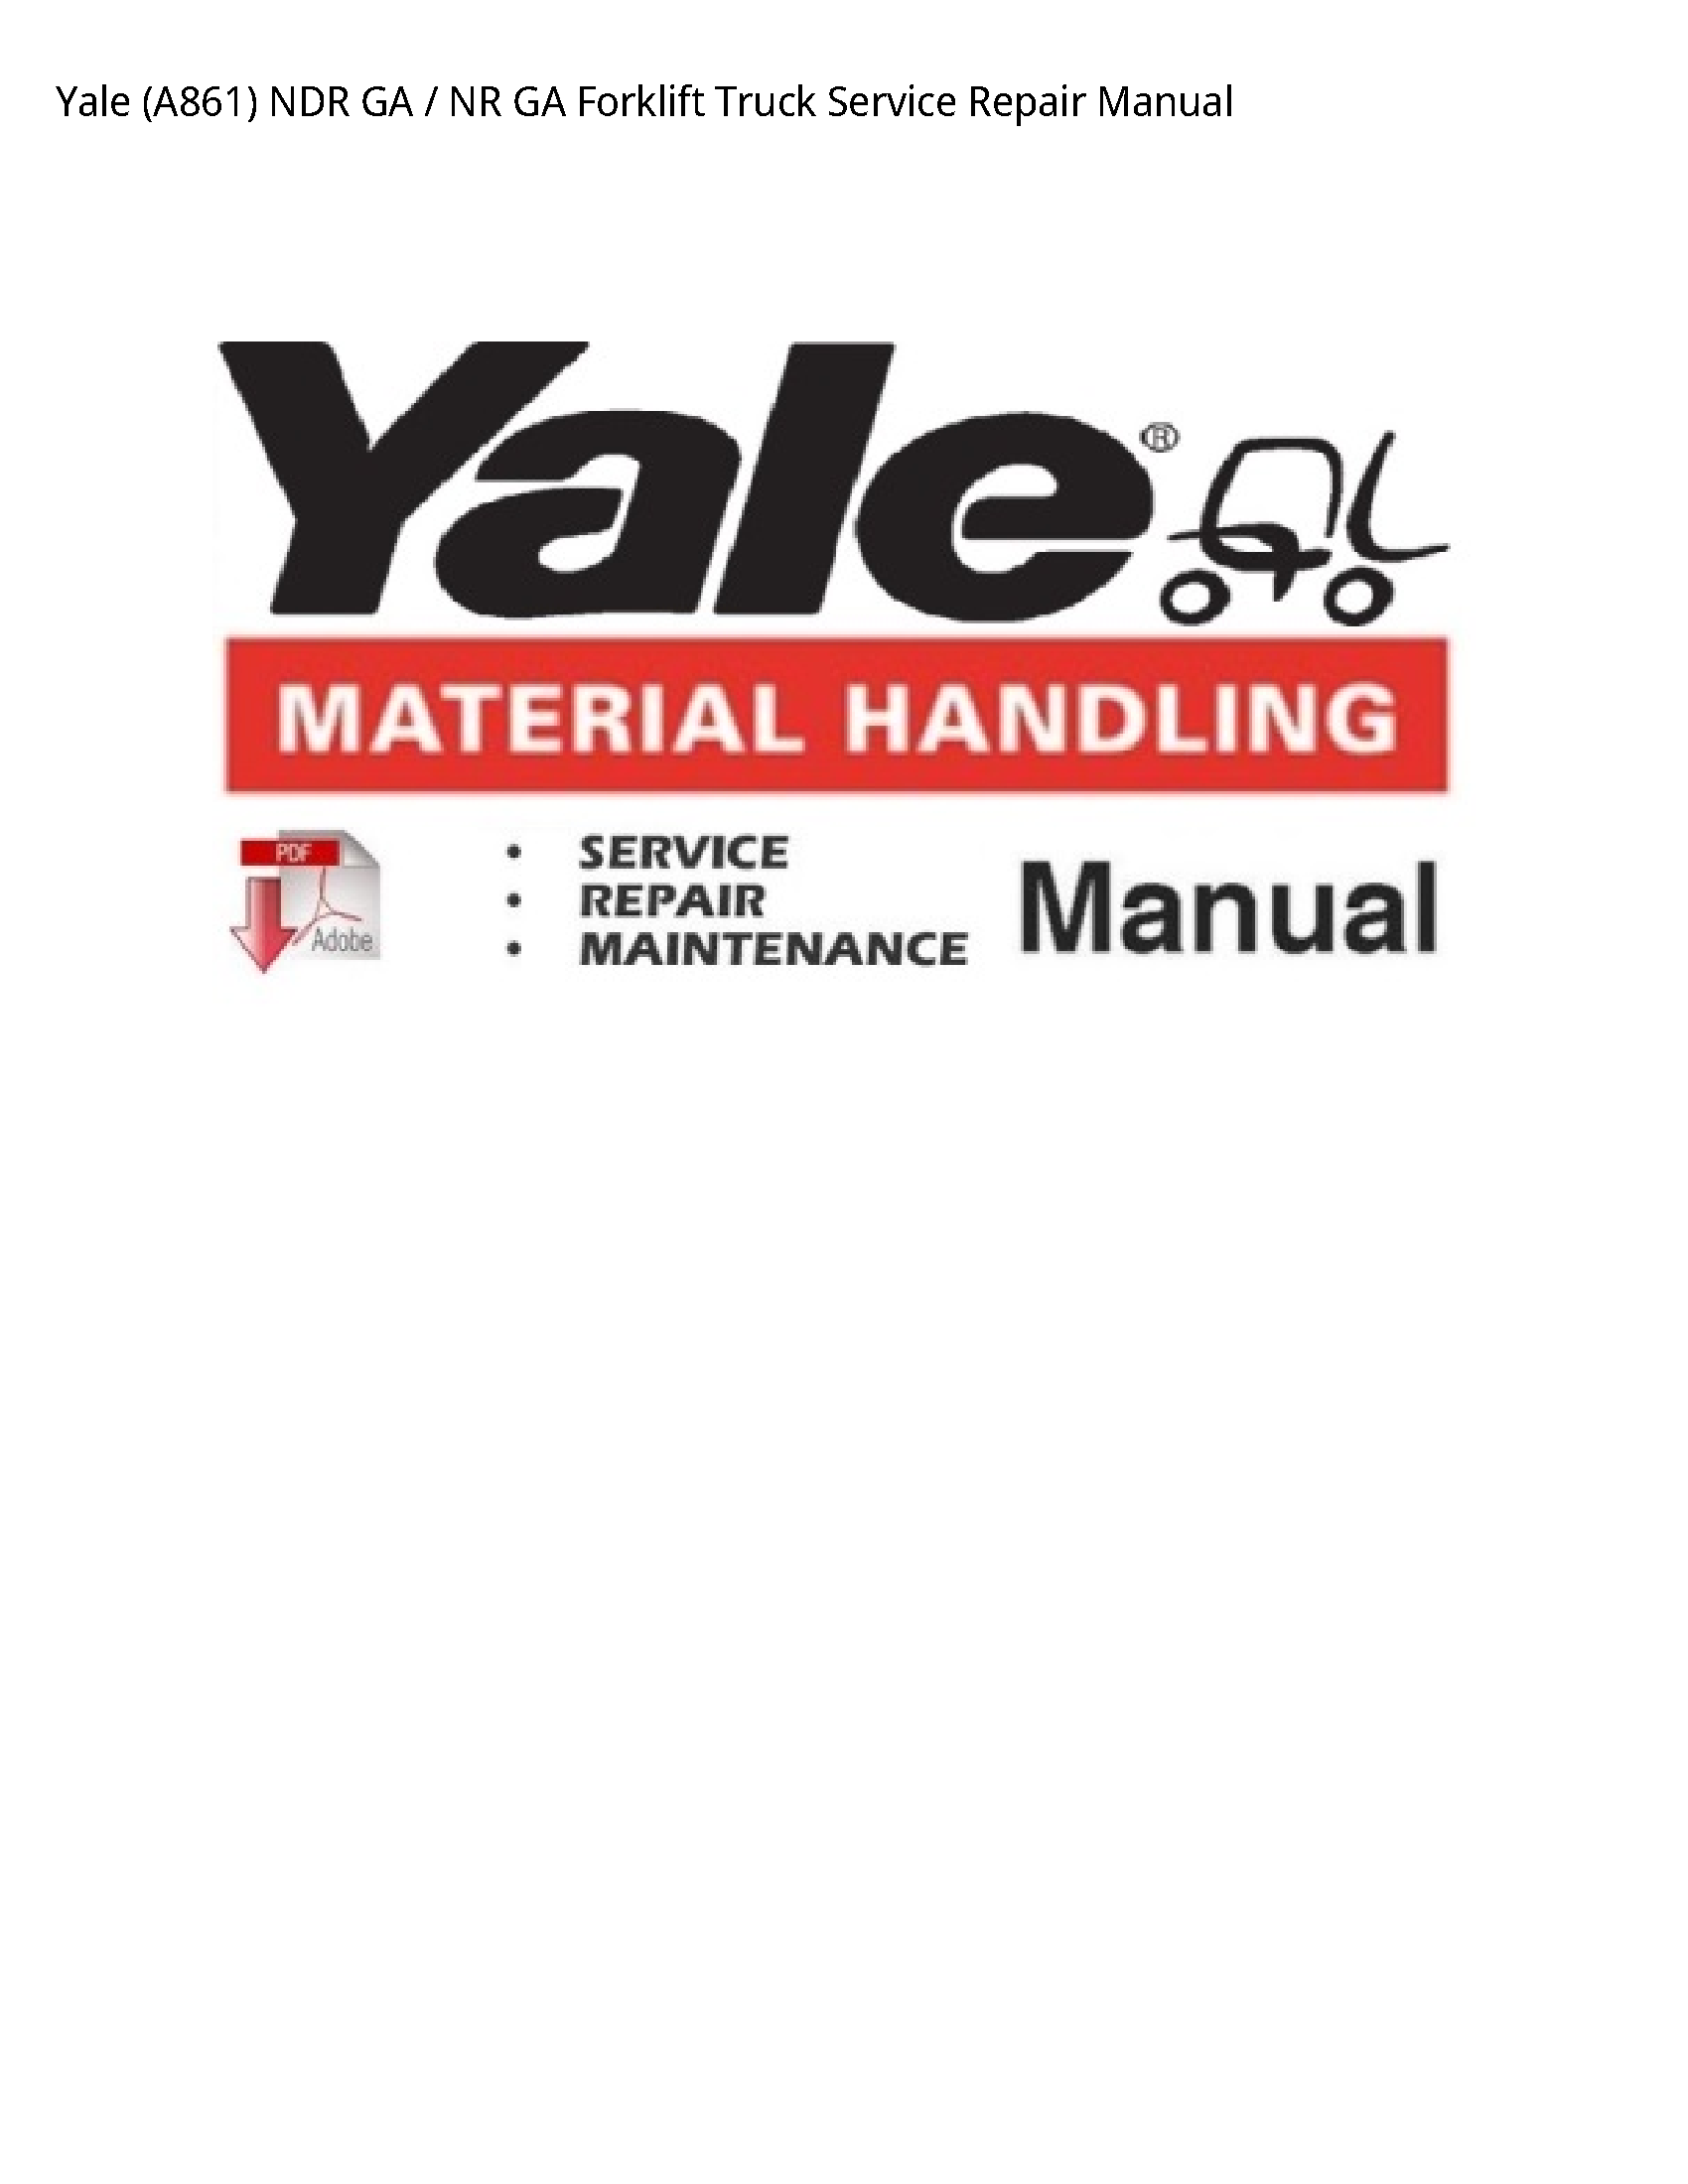 Yale (A861) NDR GA NR GA Forklift Truck manual